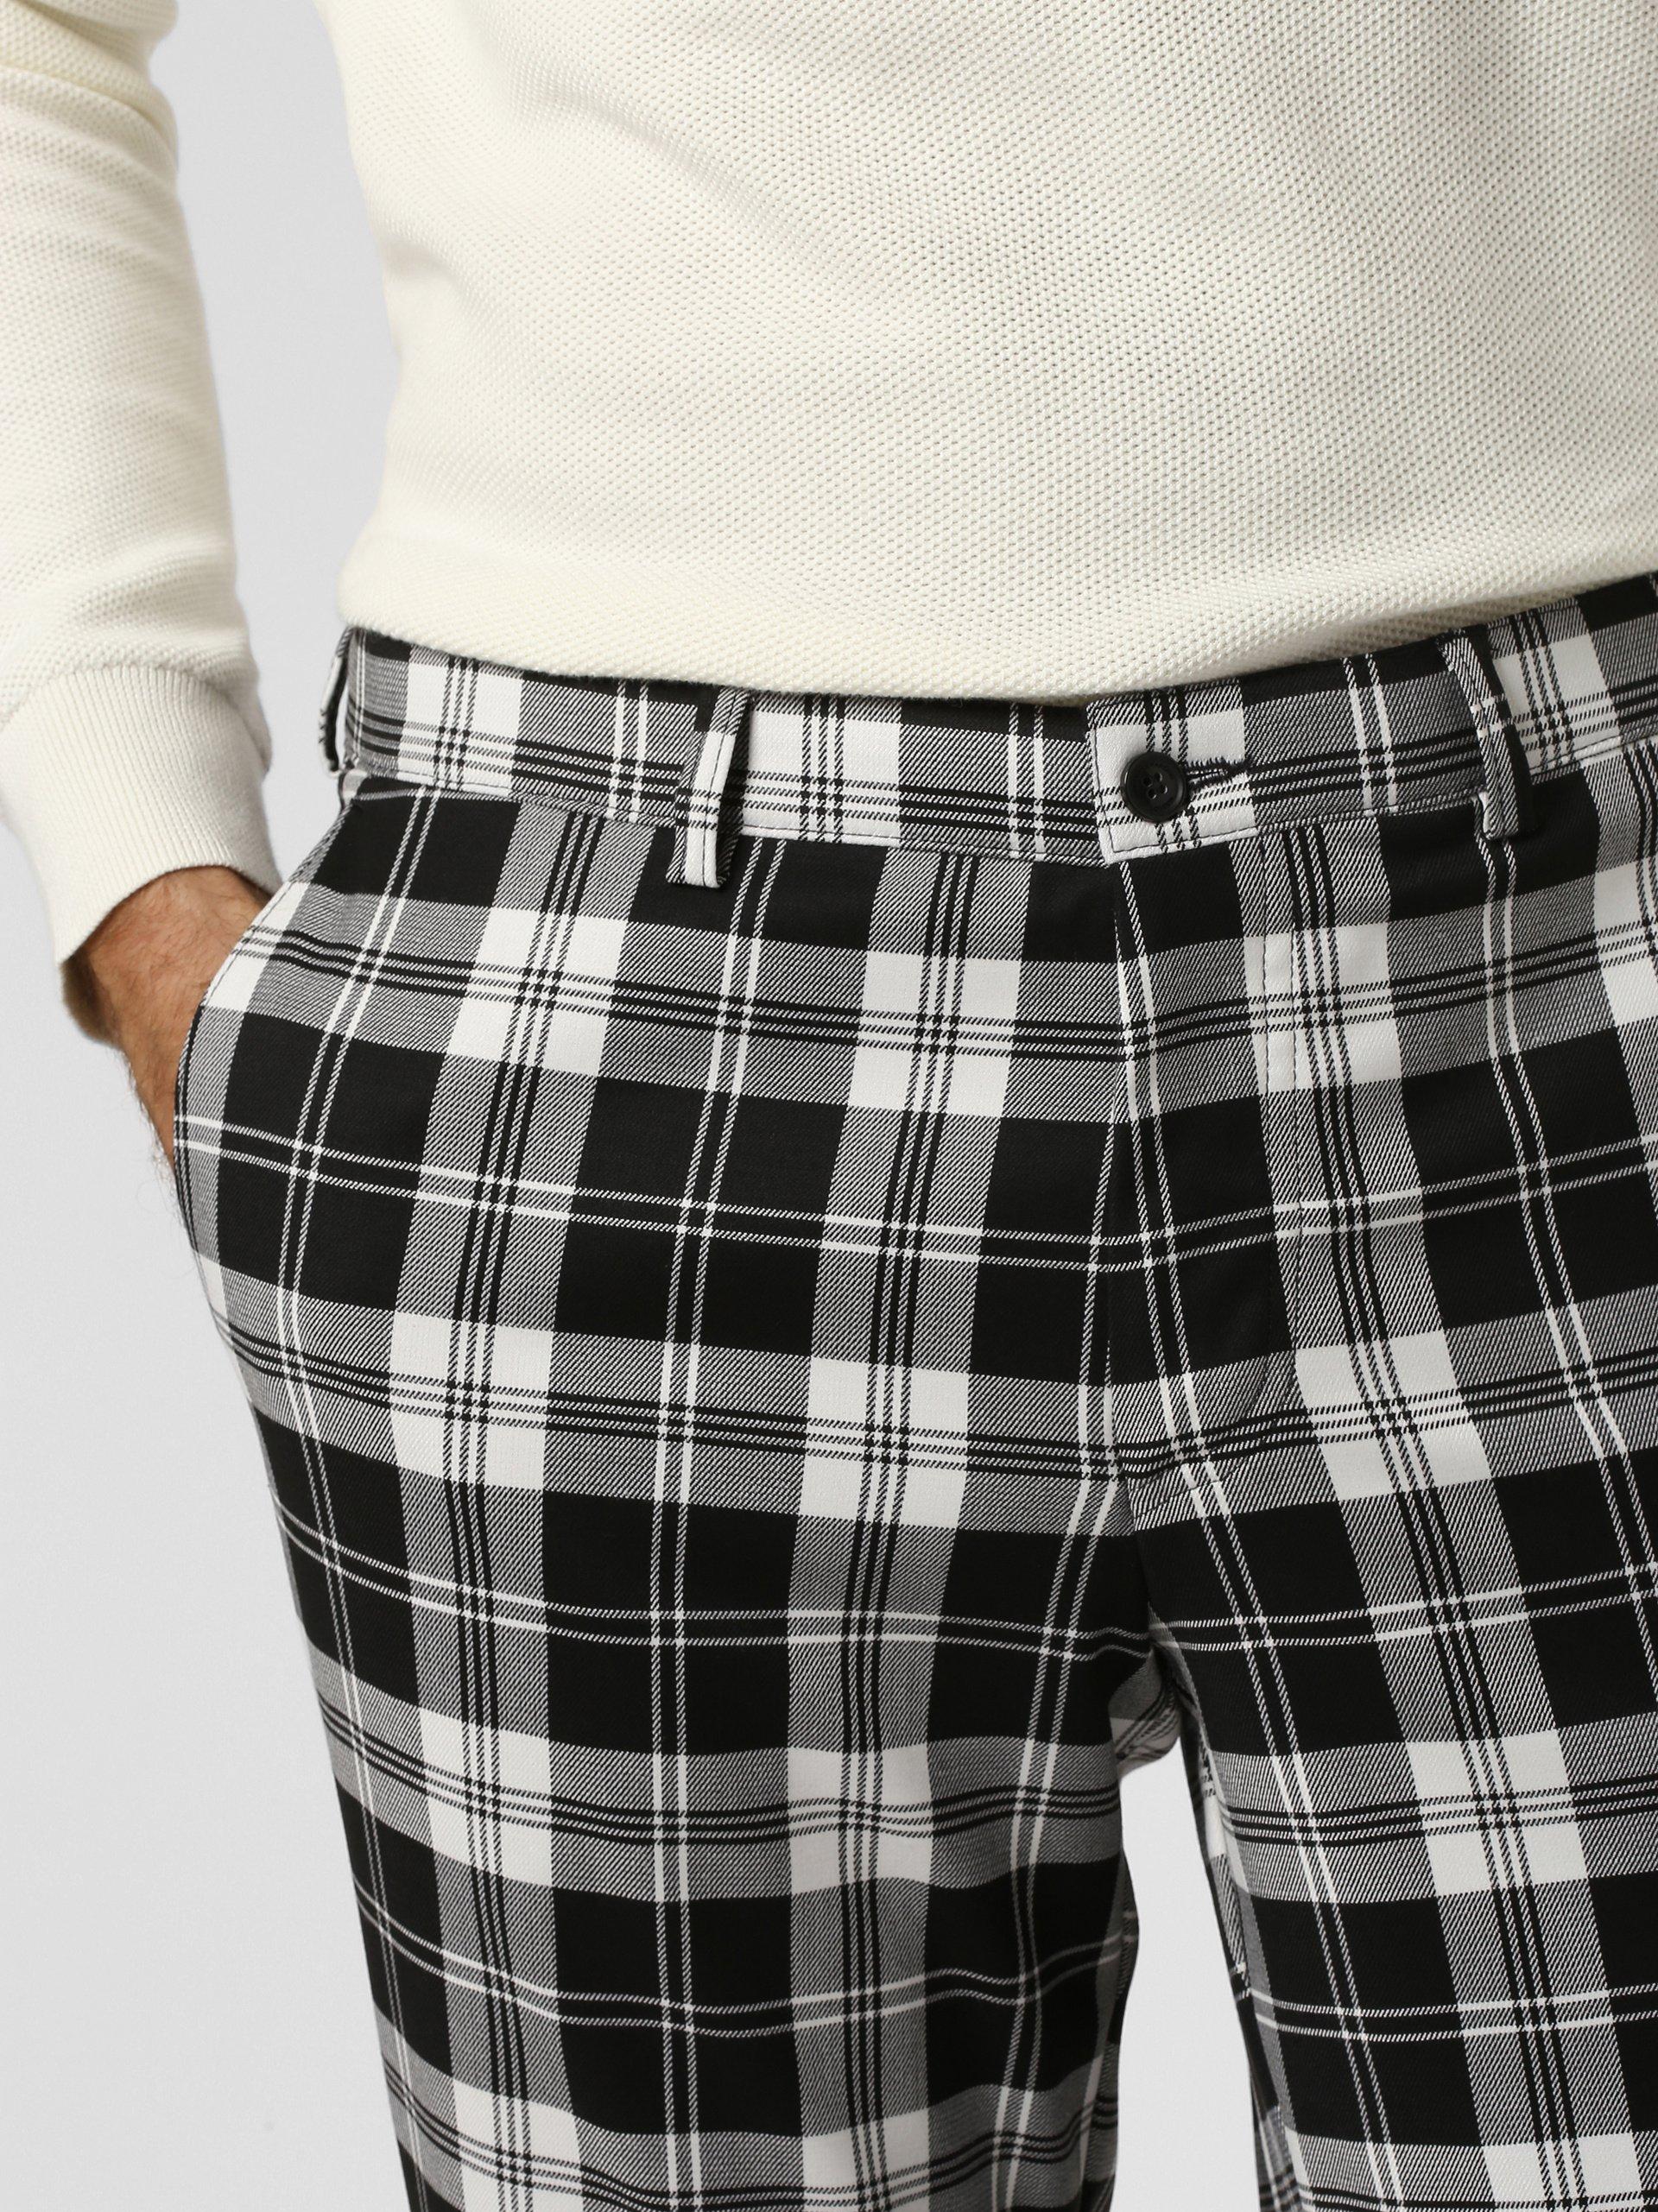 Finshley & Harding London Spodnie męskie – Kyle